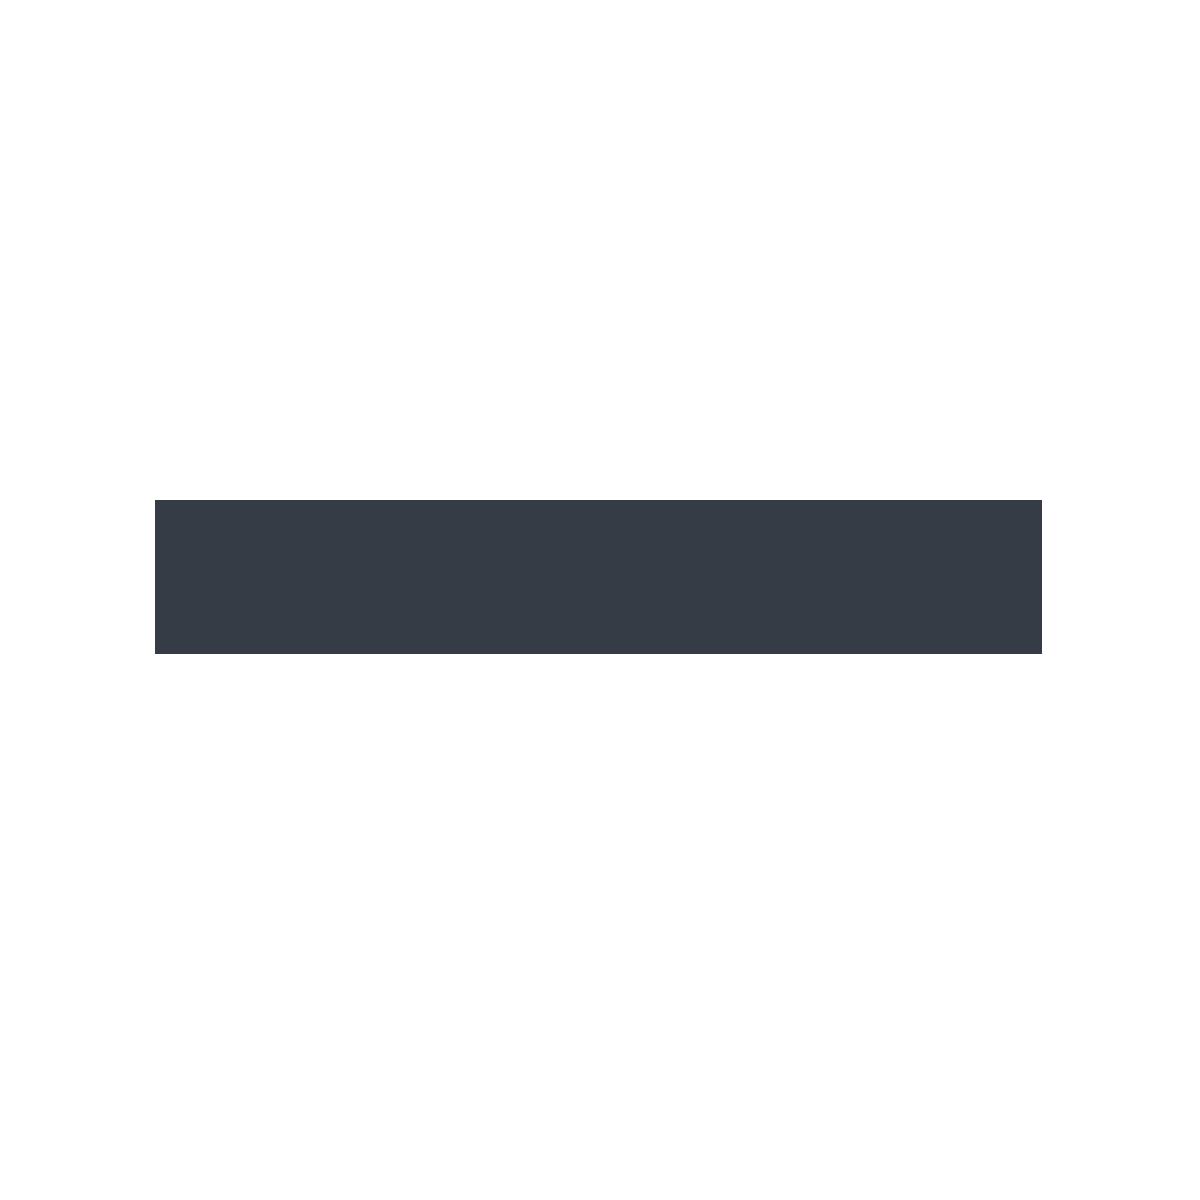 SCHÜCO ENERGY GMBH & CO. KG